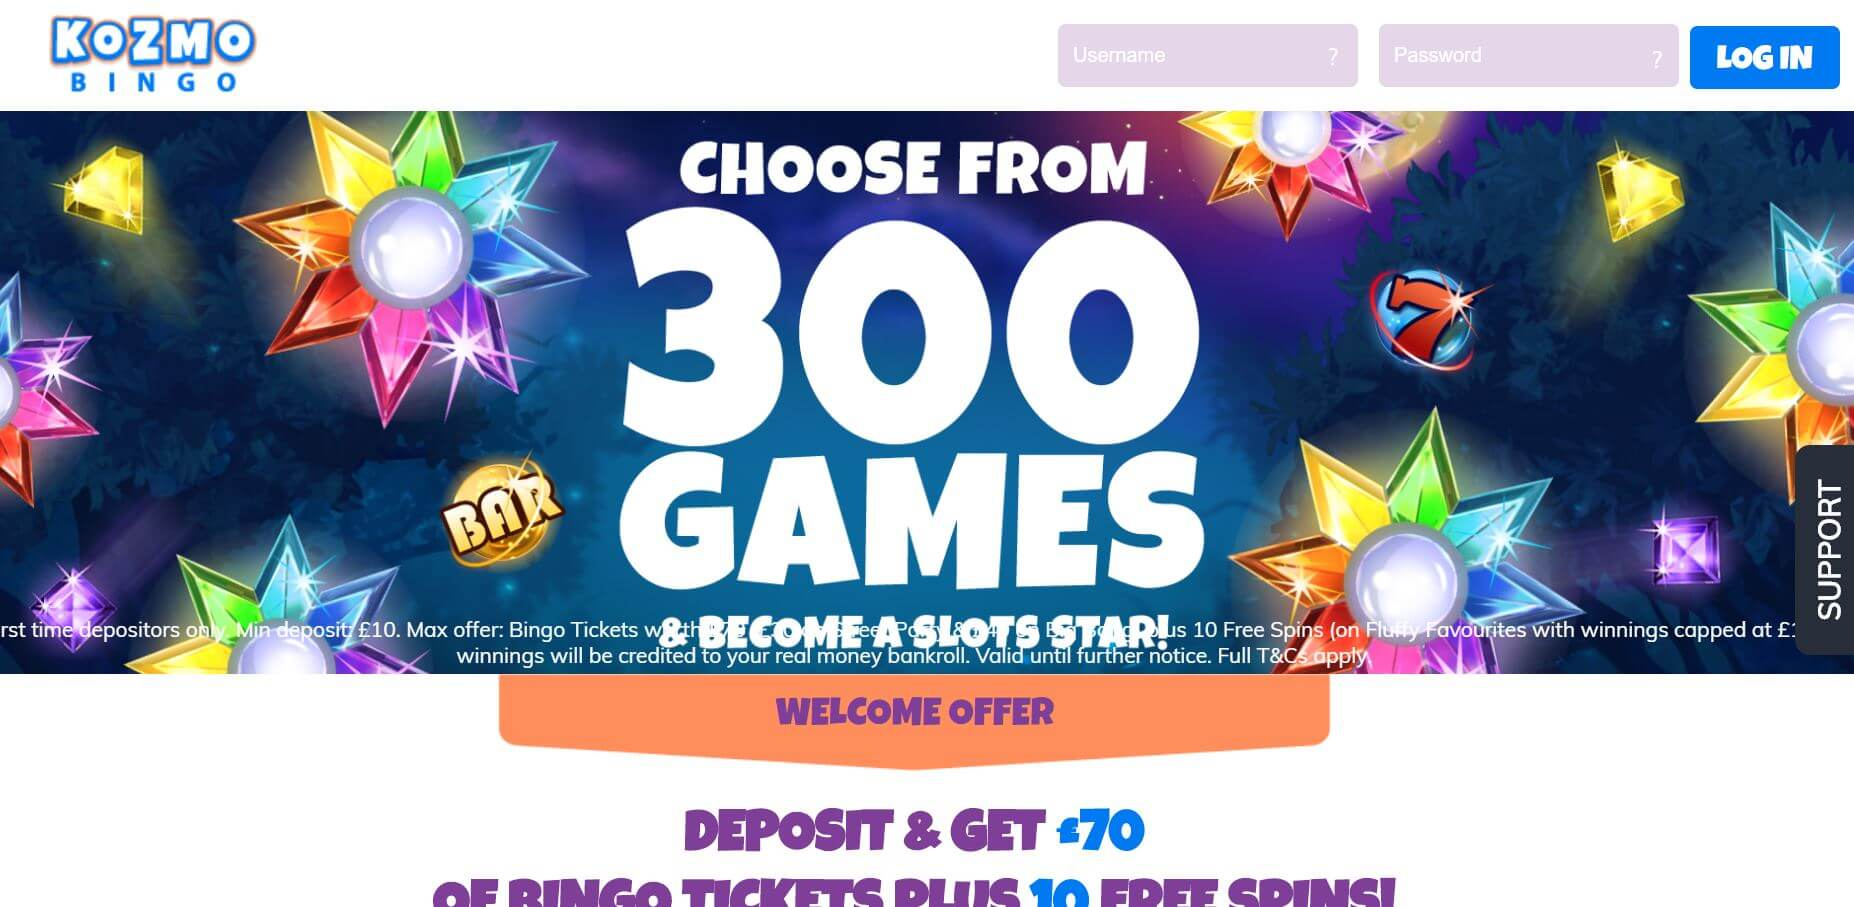 Kozmo Bingo Homepage